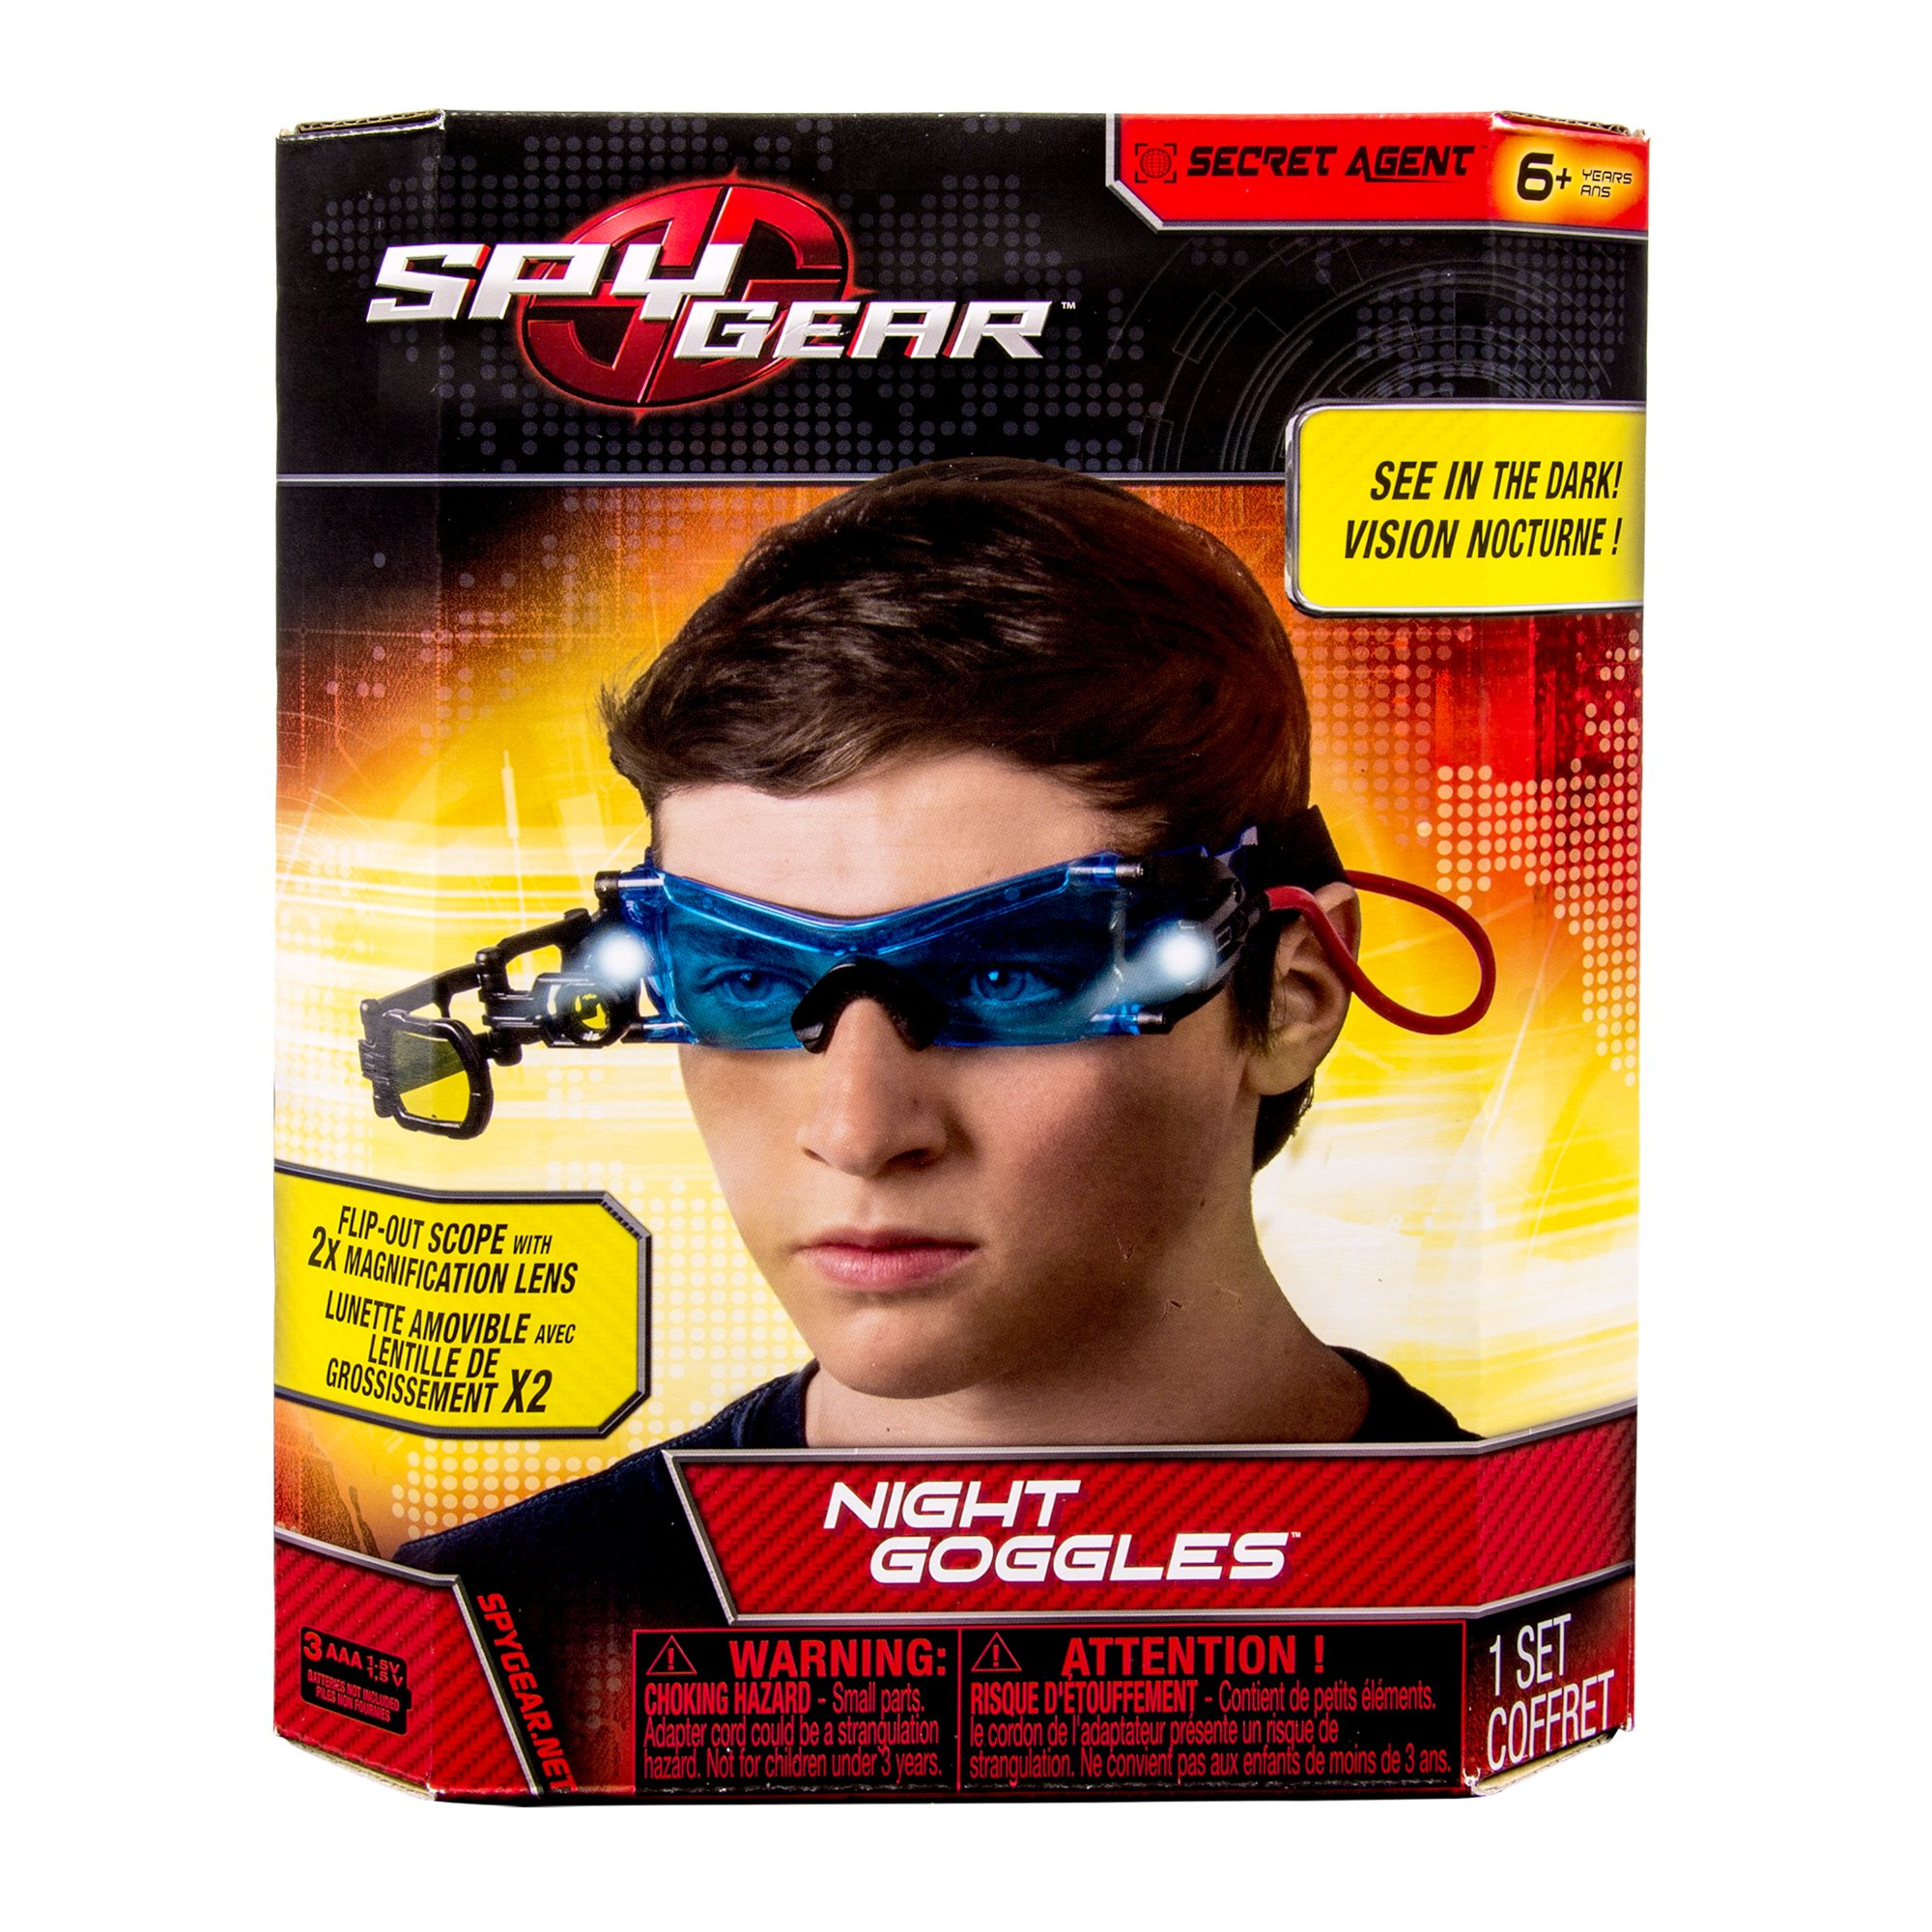 Spy Gear - Night Goggles by Spy Gear